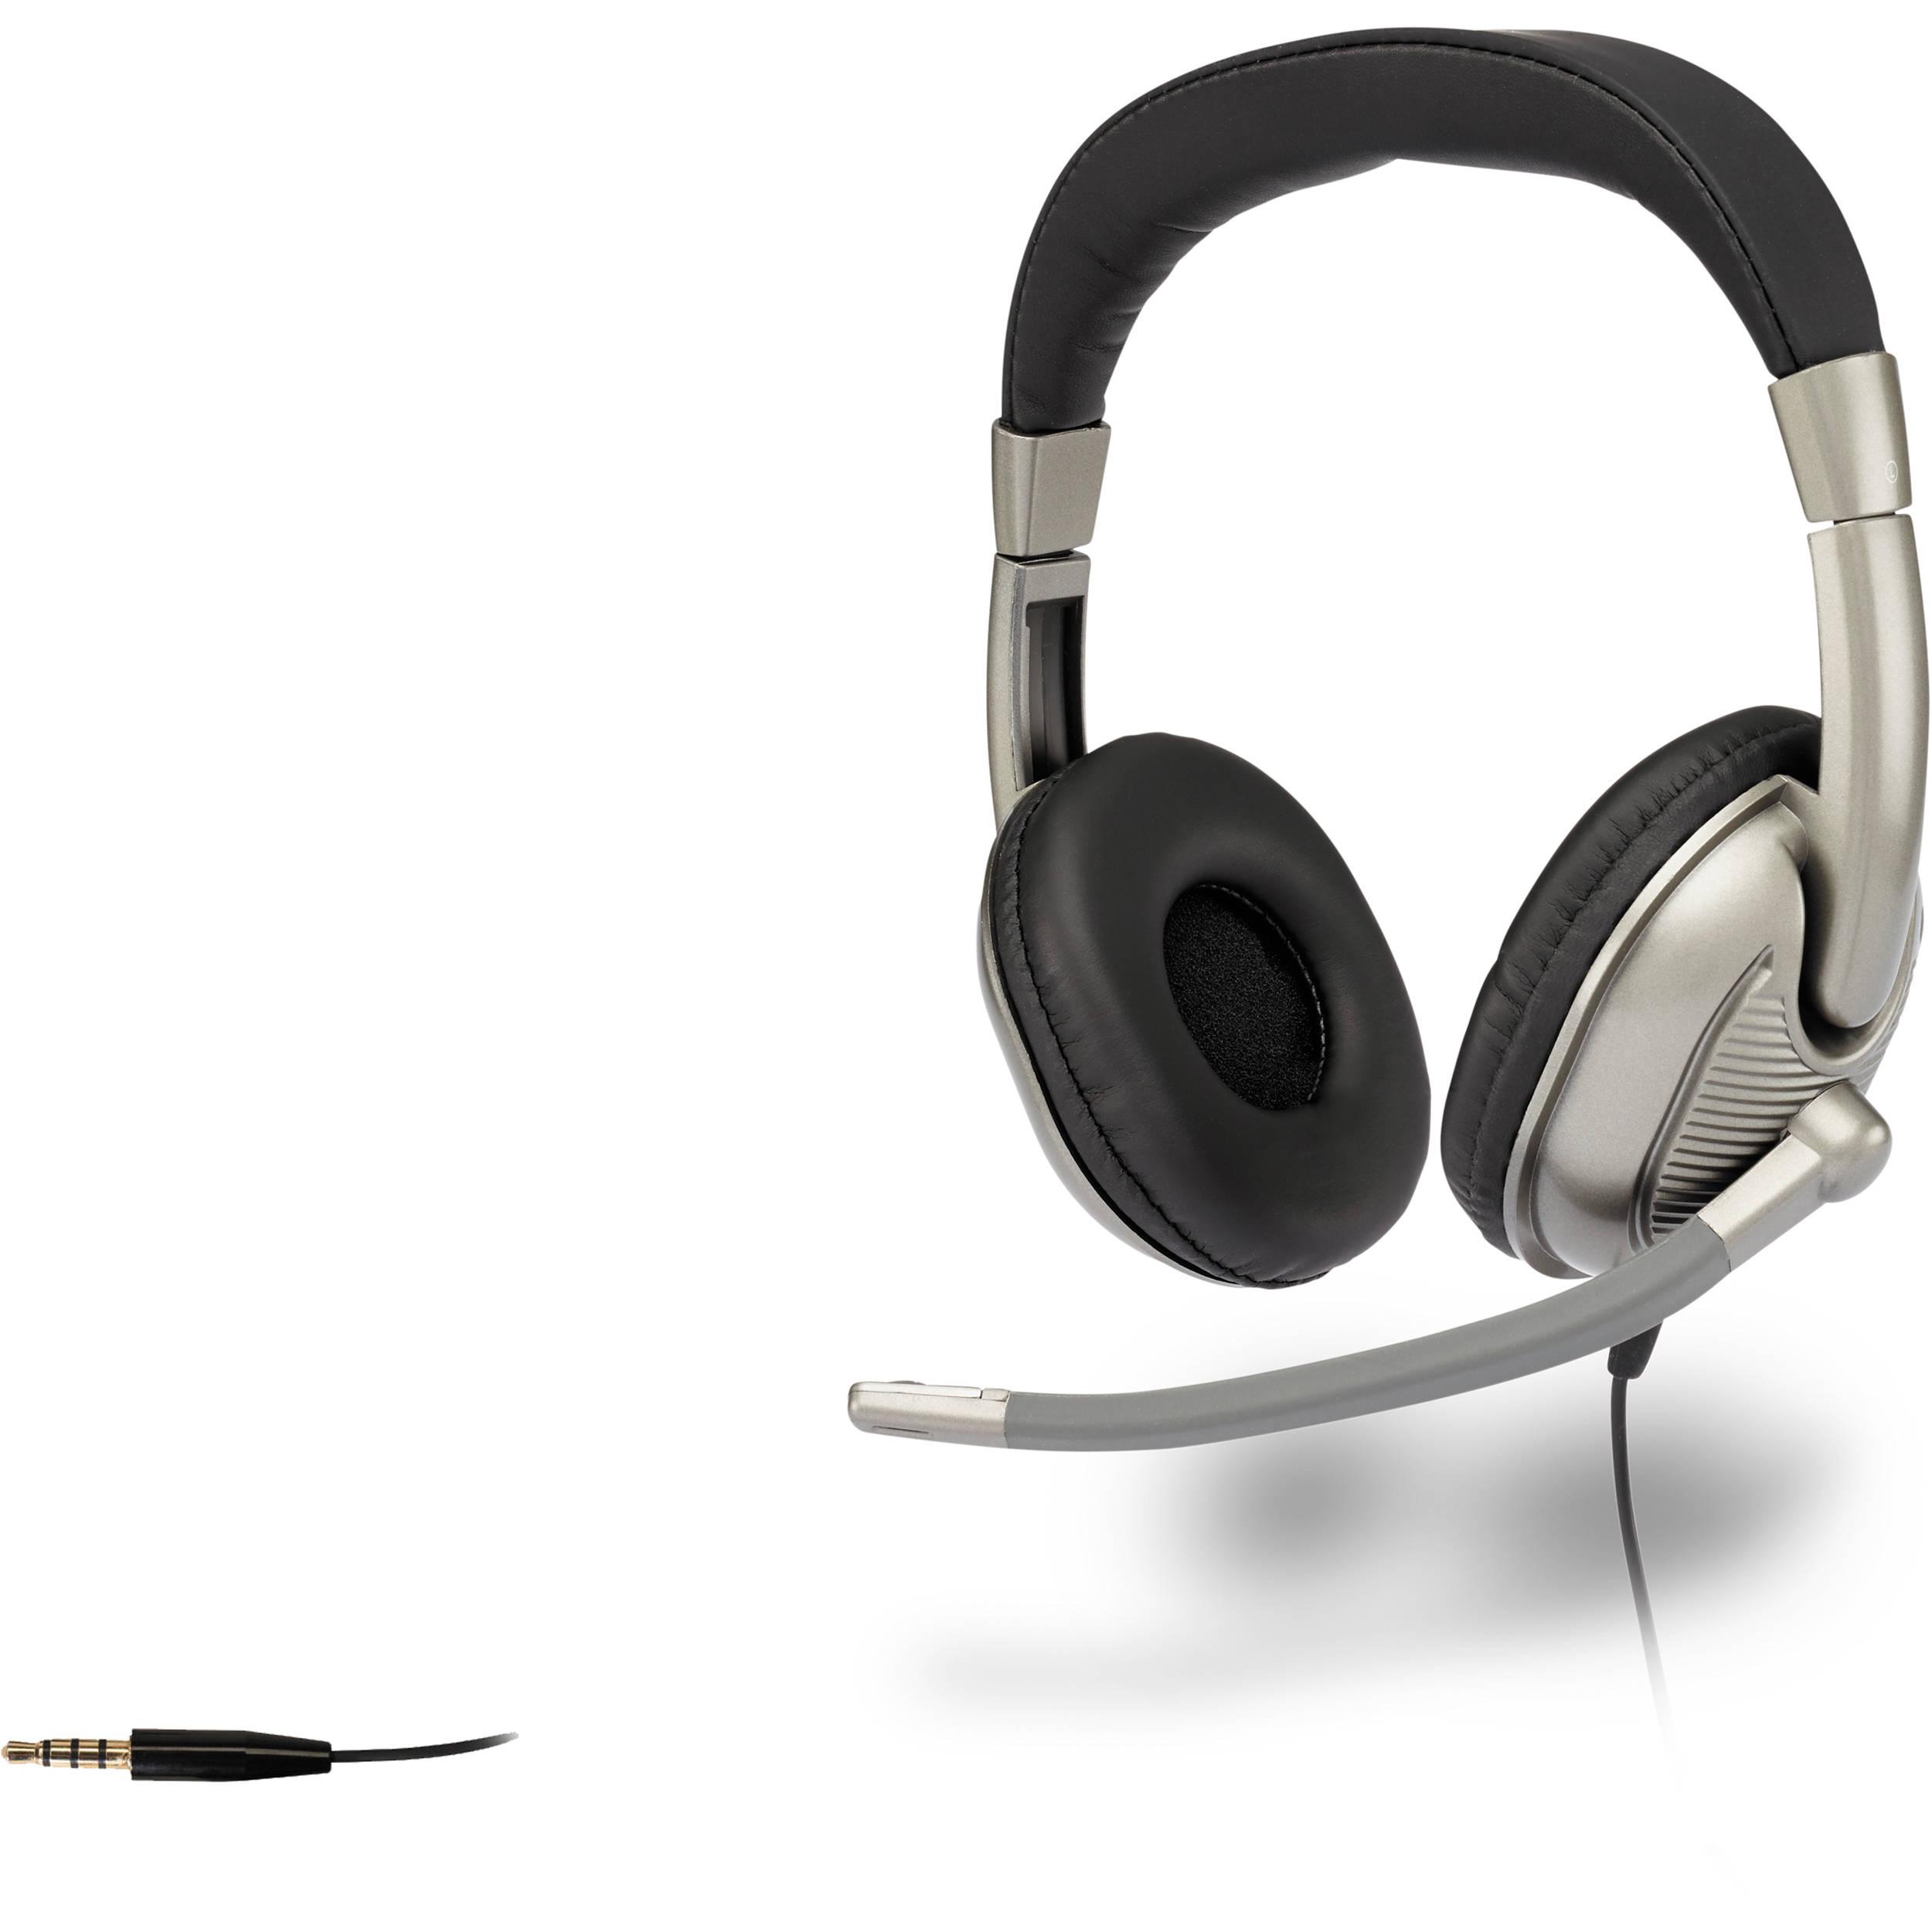 Cyber Acoustics AC-8002 Stereo Headset for Kids K8 - 12